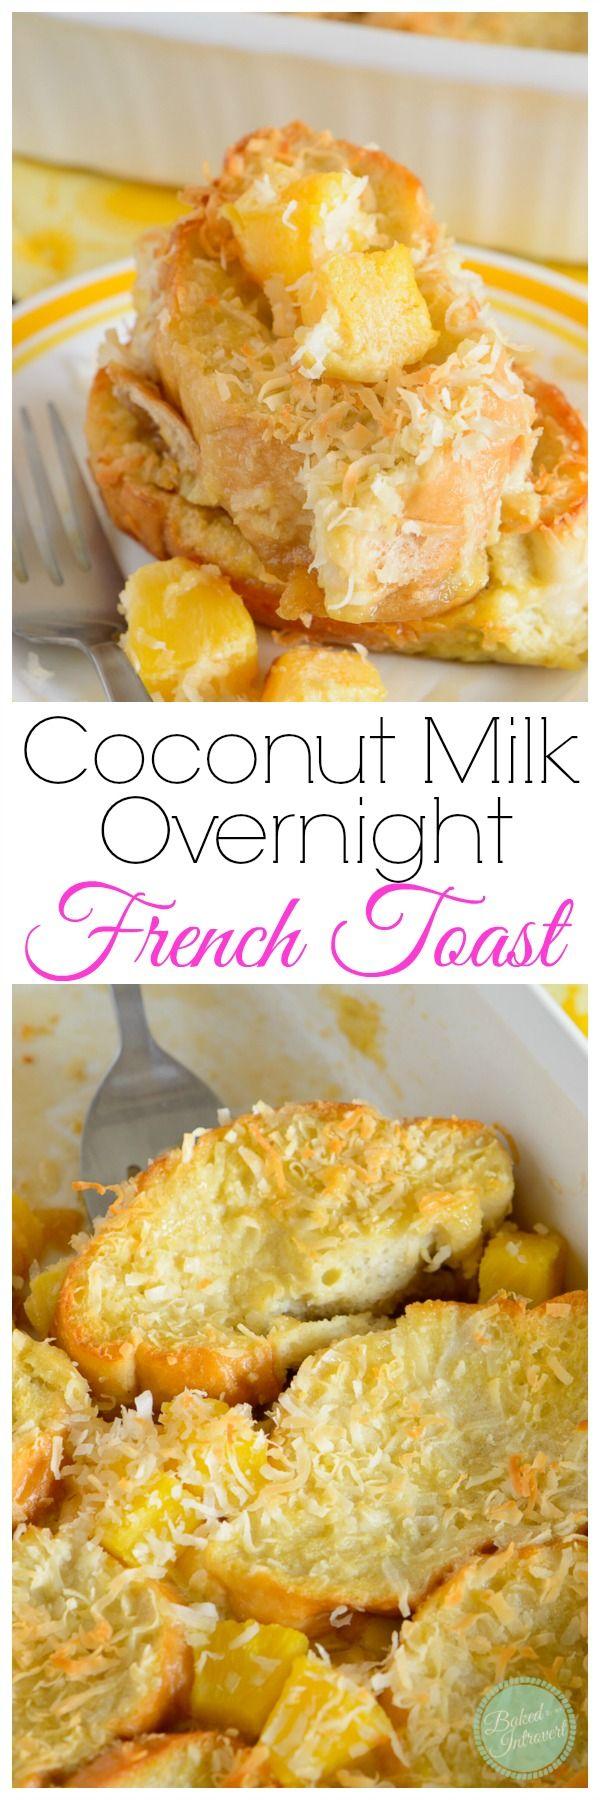 COCONUT MILK OVERNIGHT FRENCH TOAST